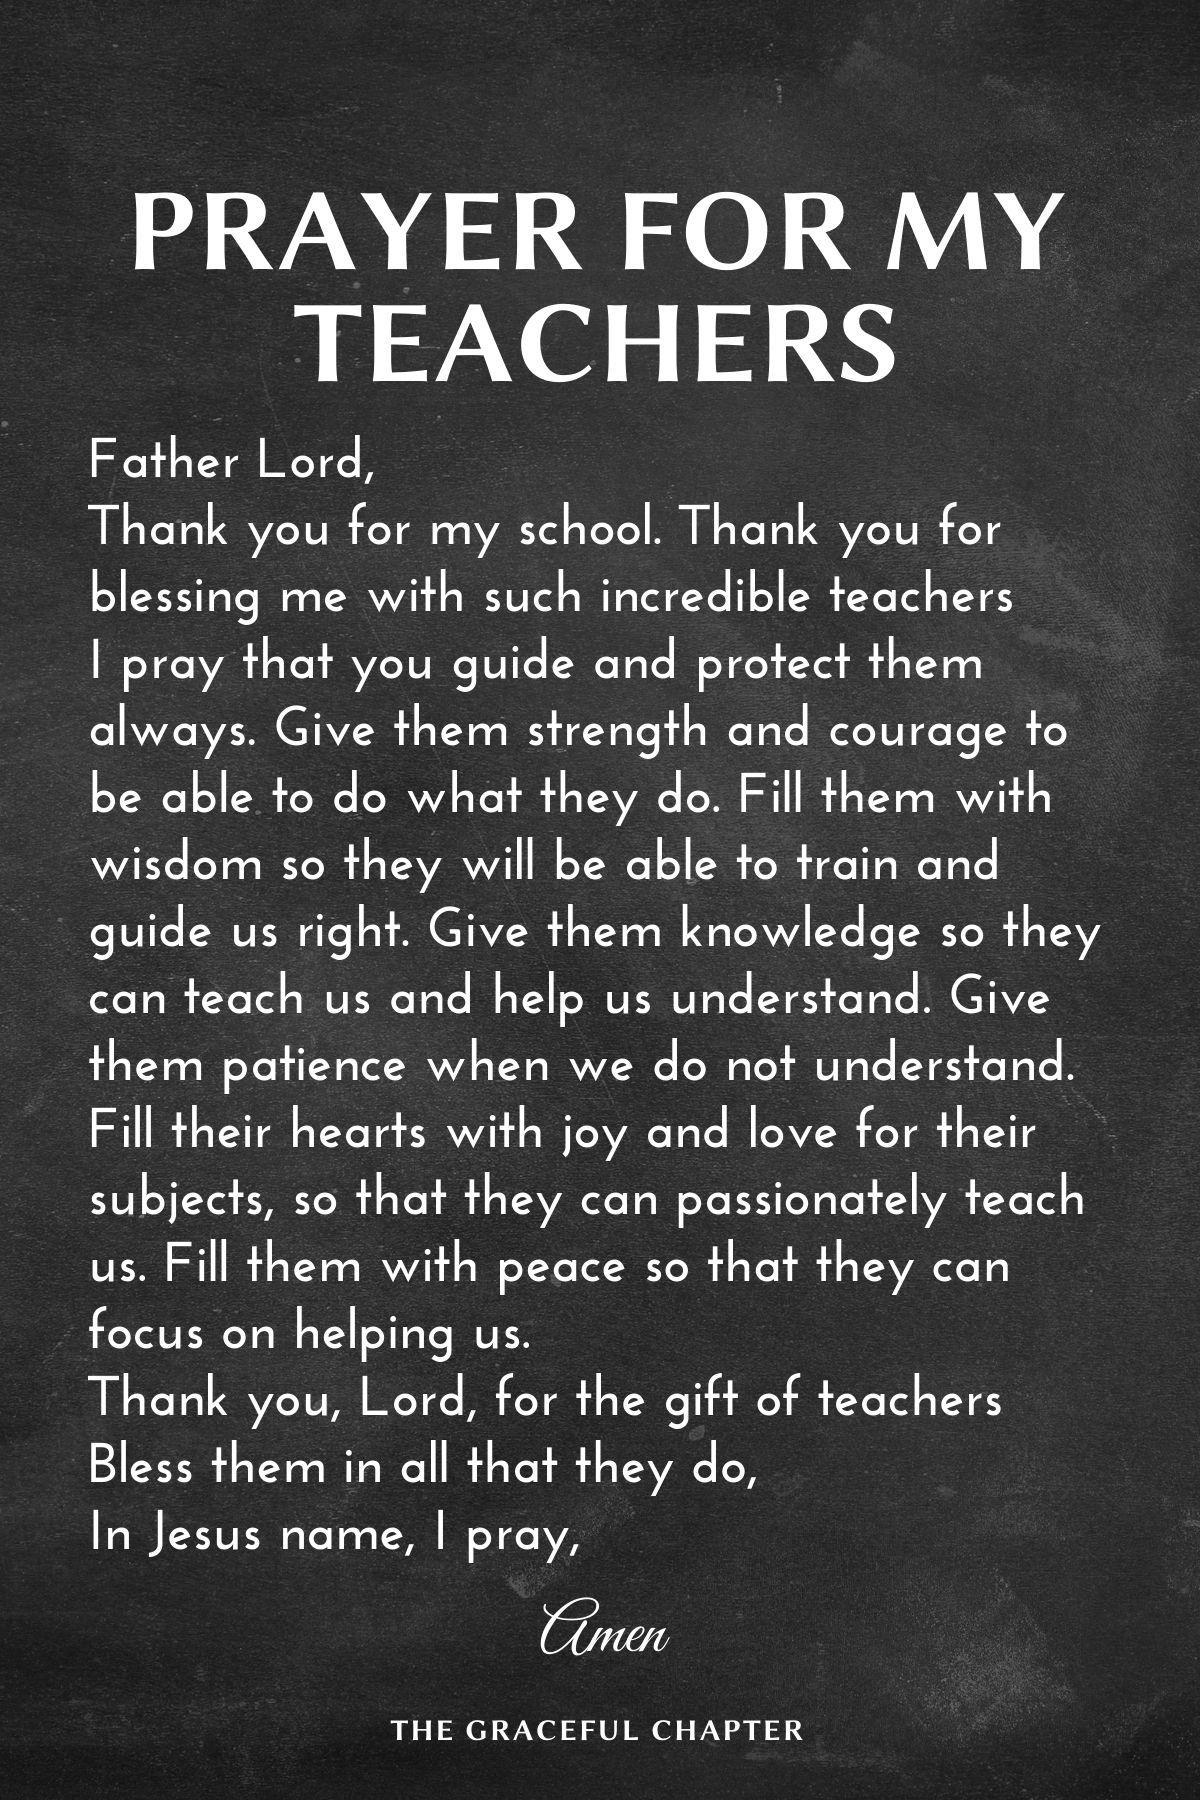 Prayer for my teachers